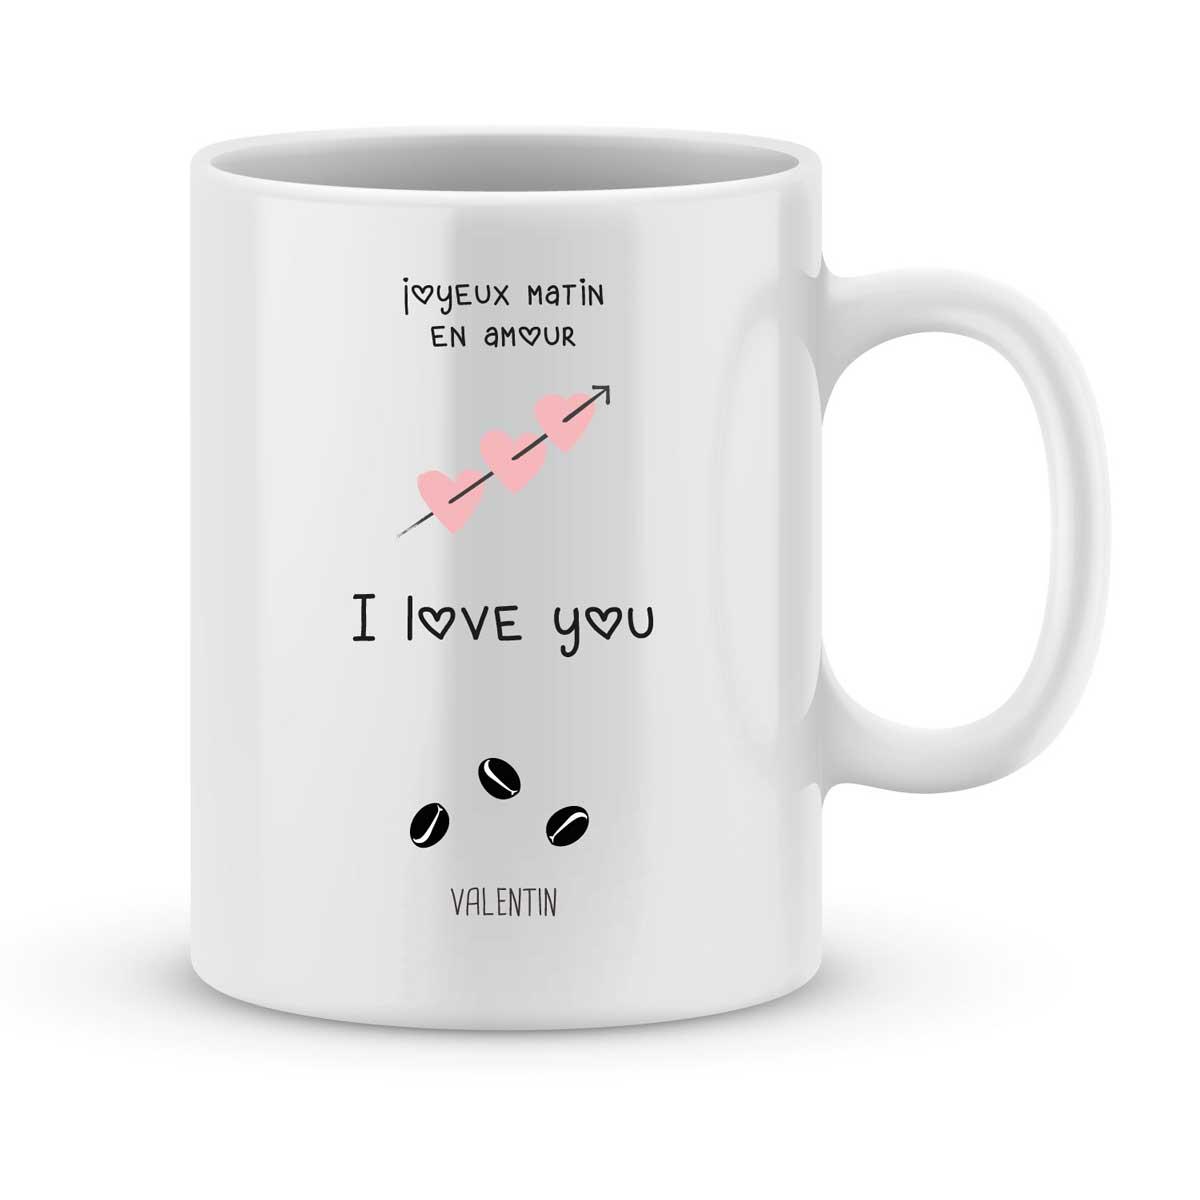 Audacieux Mug personnalisé avec un prénom joyeux matin en amour - Joli Mug FH-33